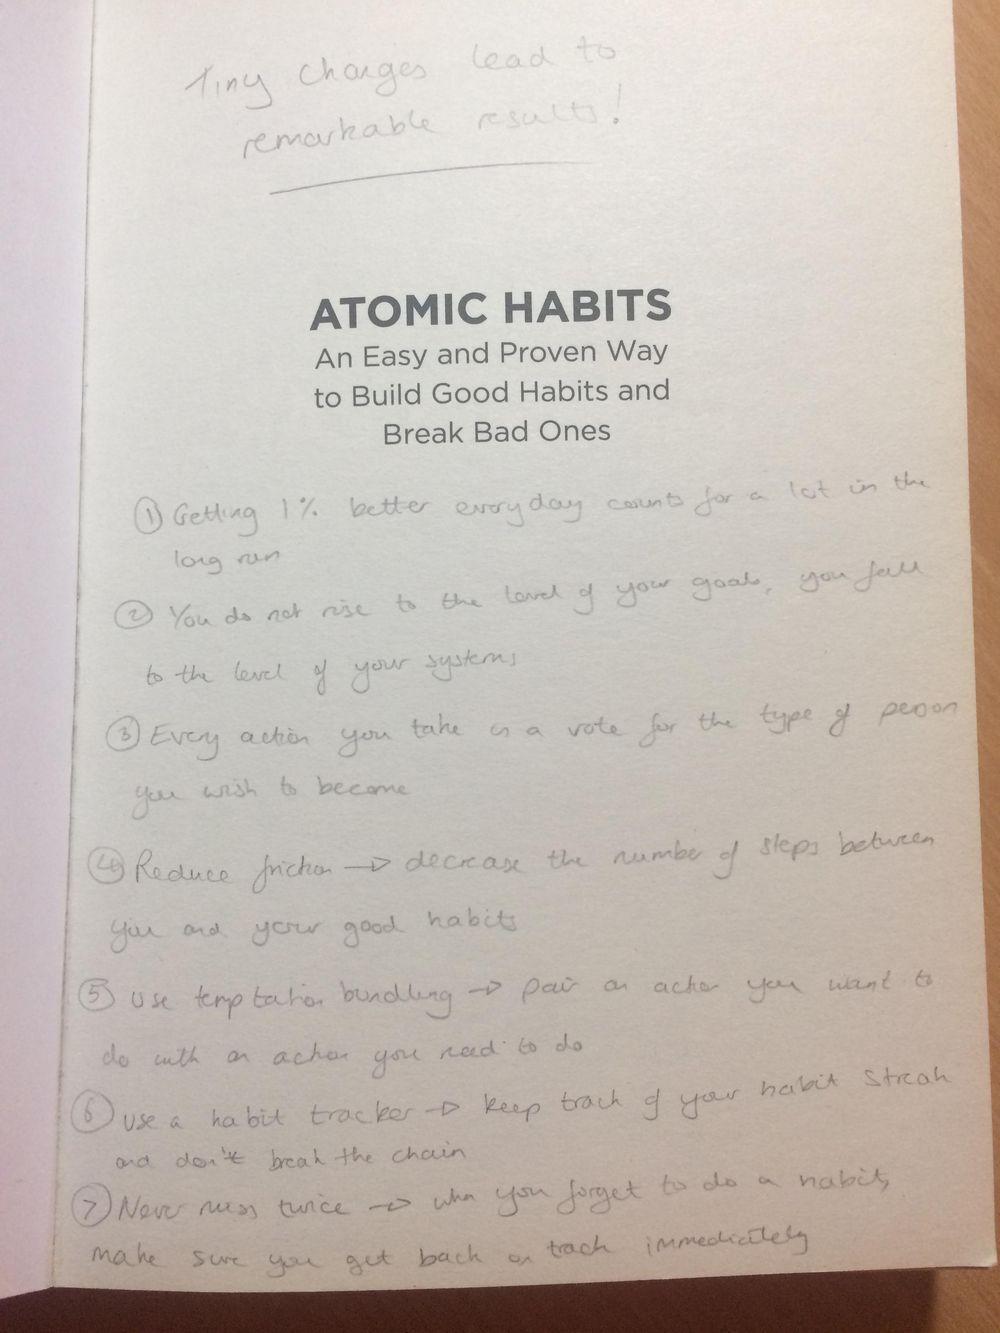 Atomic Habits - image 1 - student project